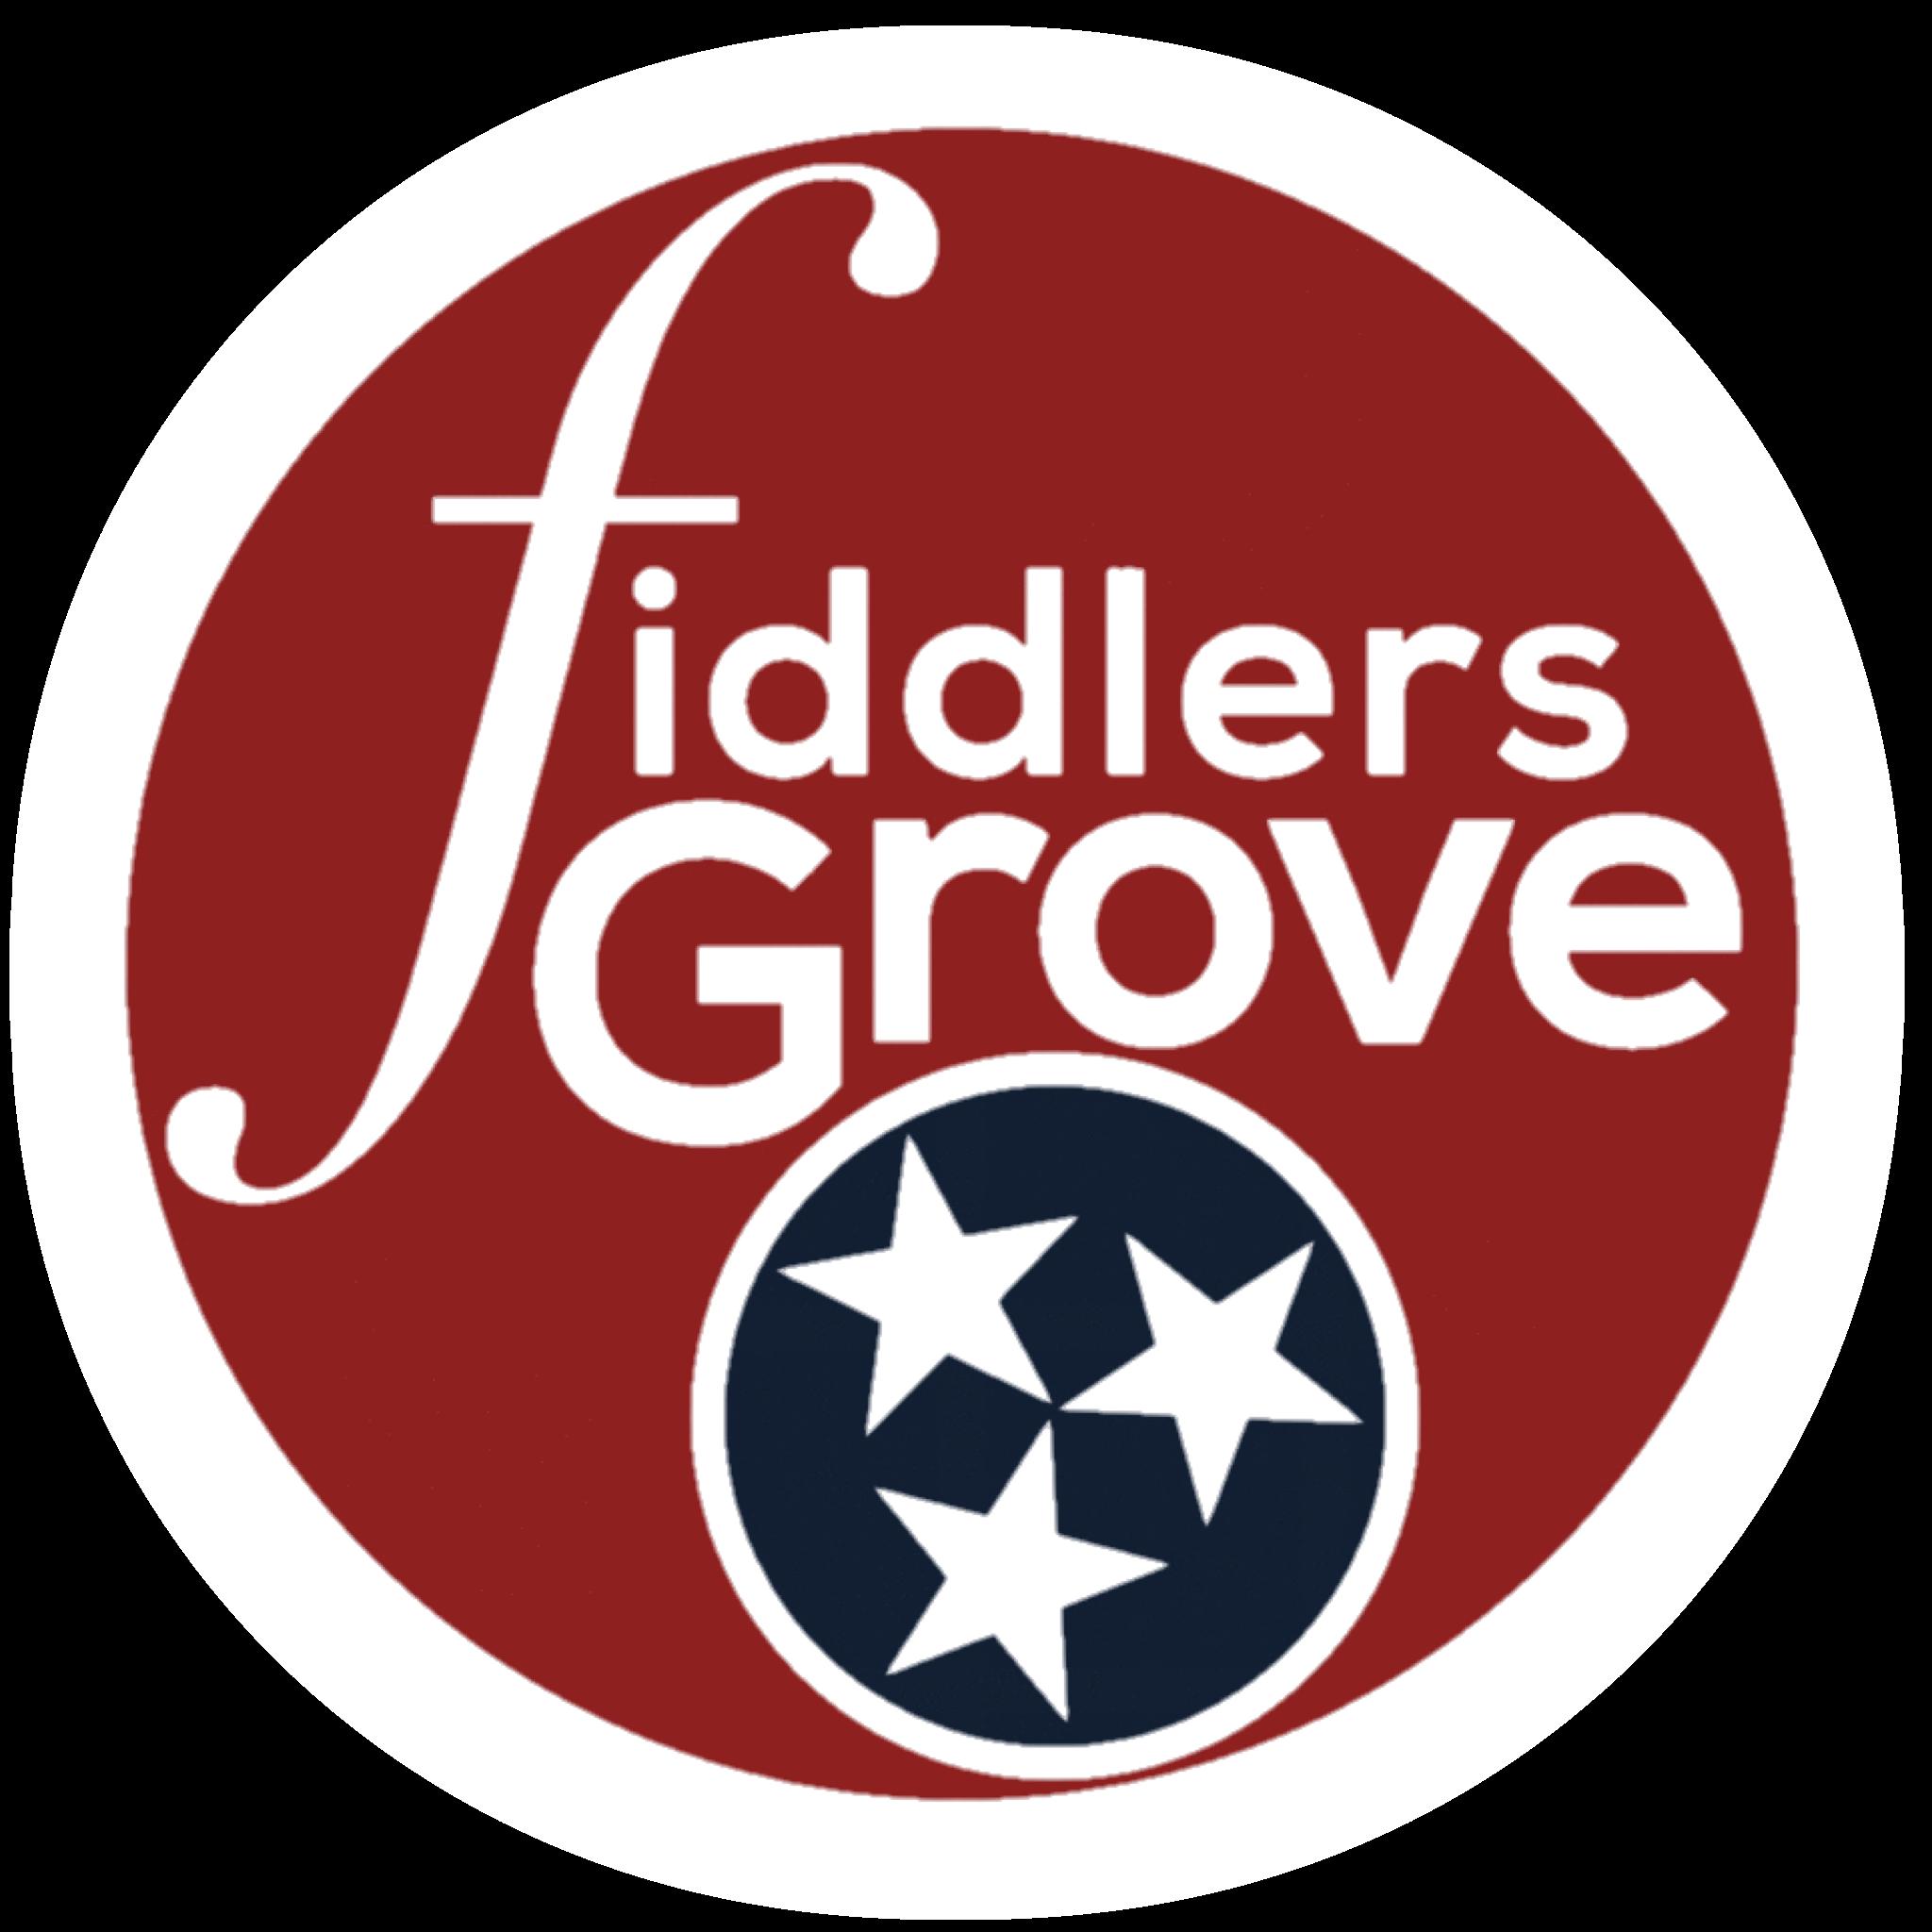 Fiddlers Grove Historic Village